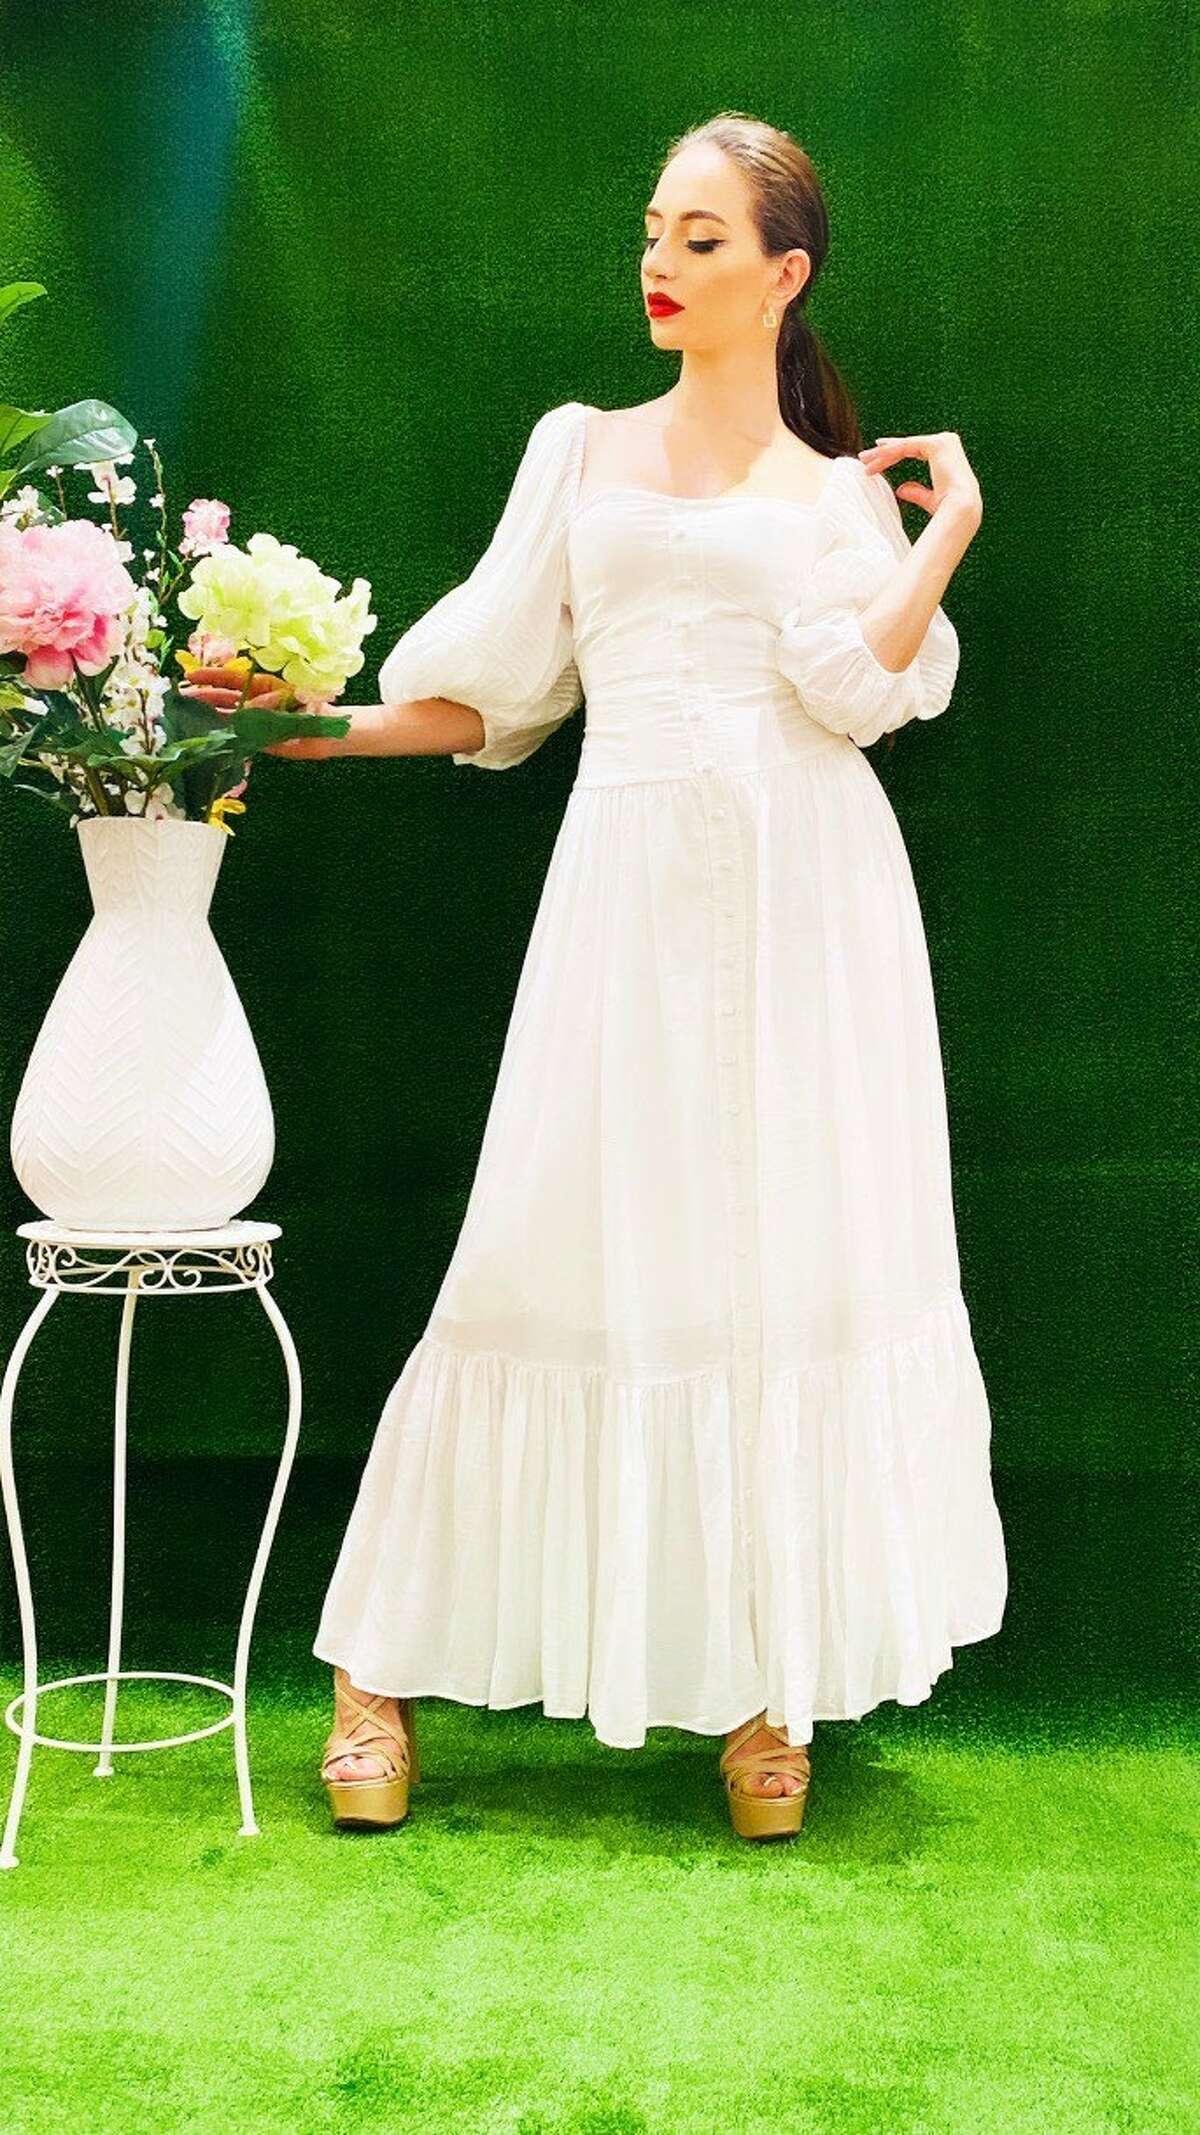 Danielle Emon's take on white, flowy dresses.